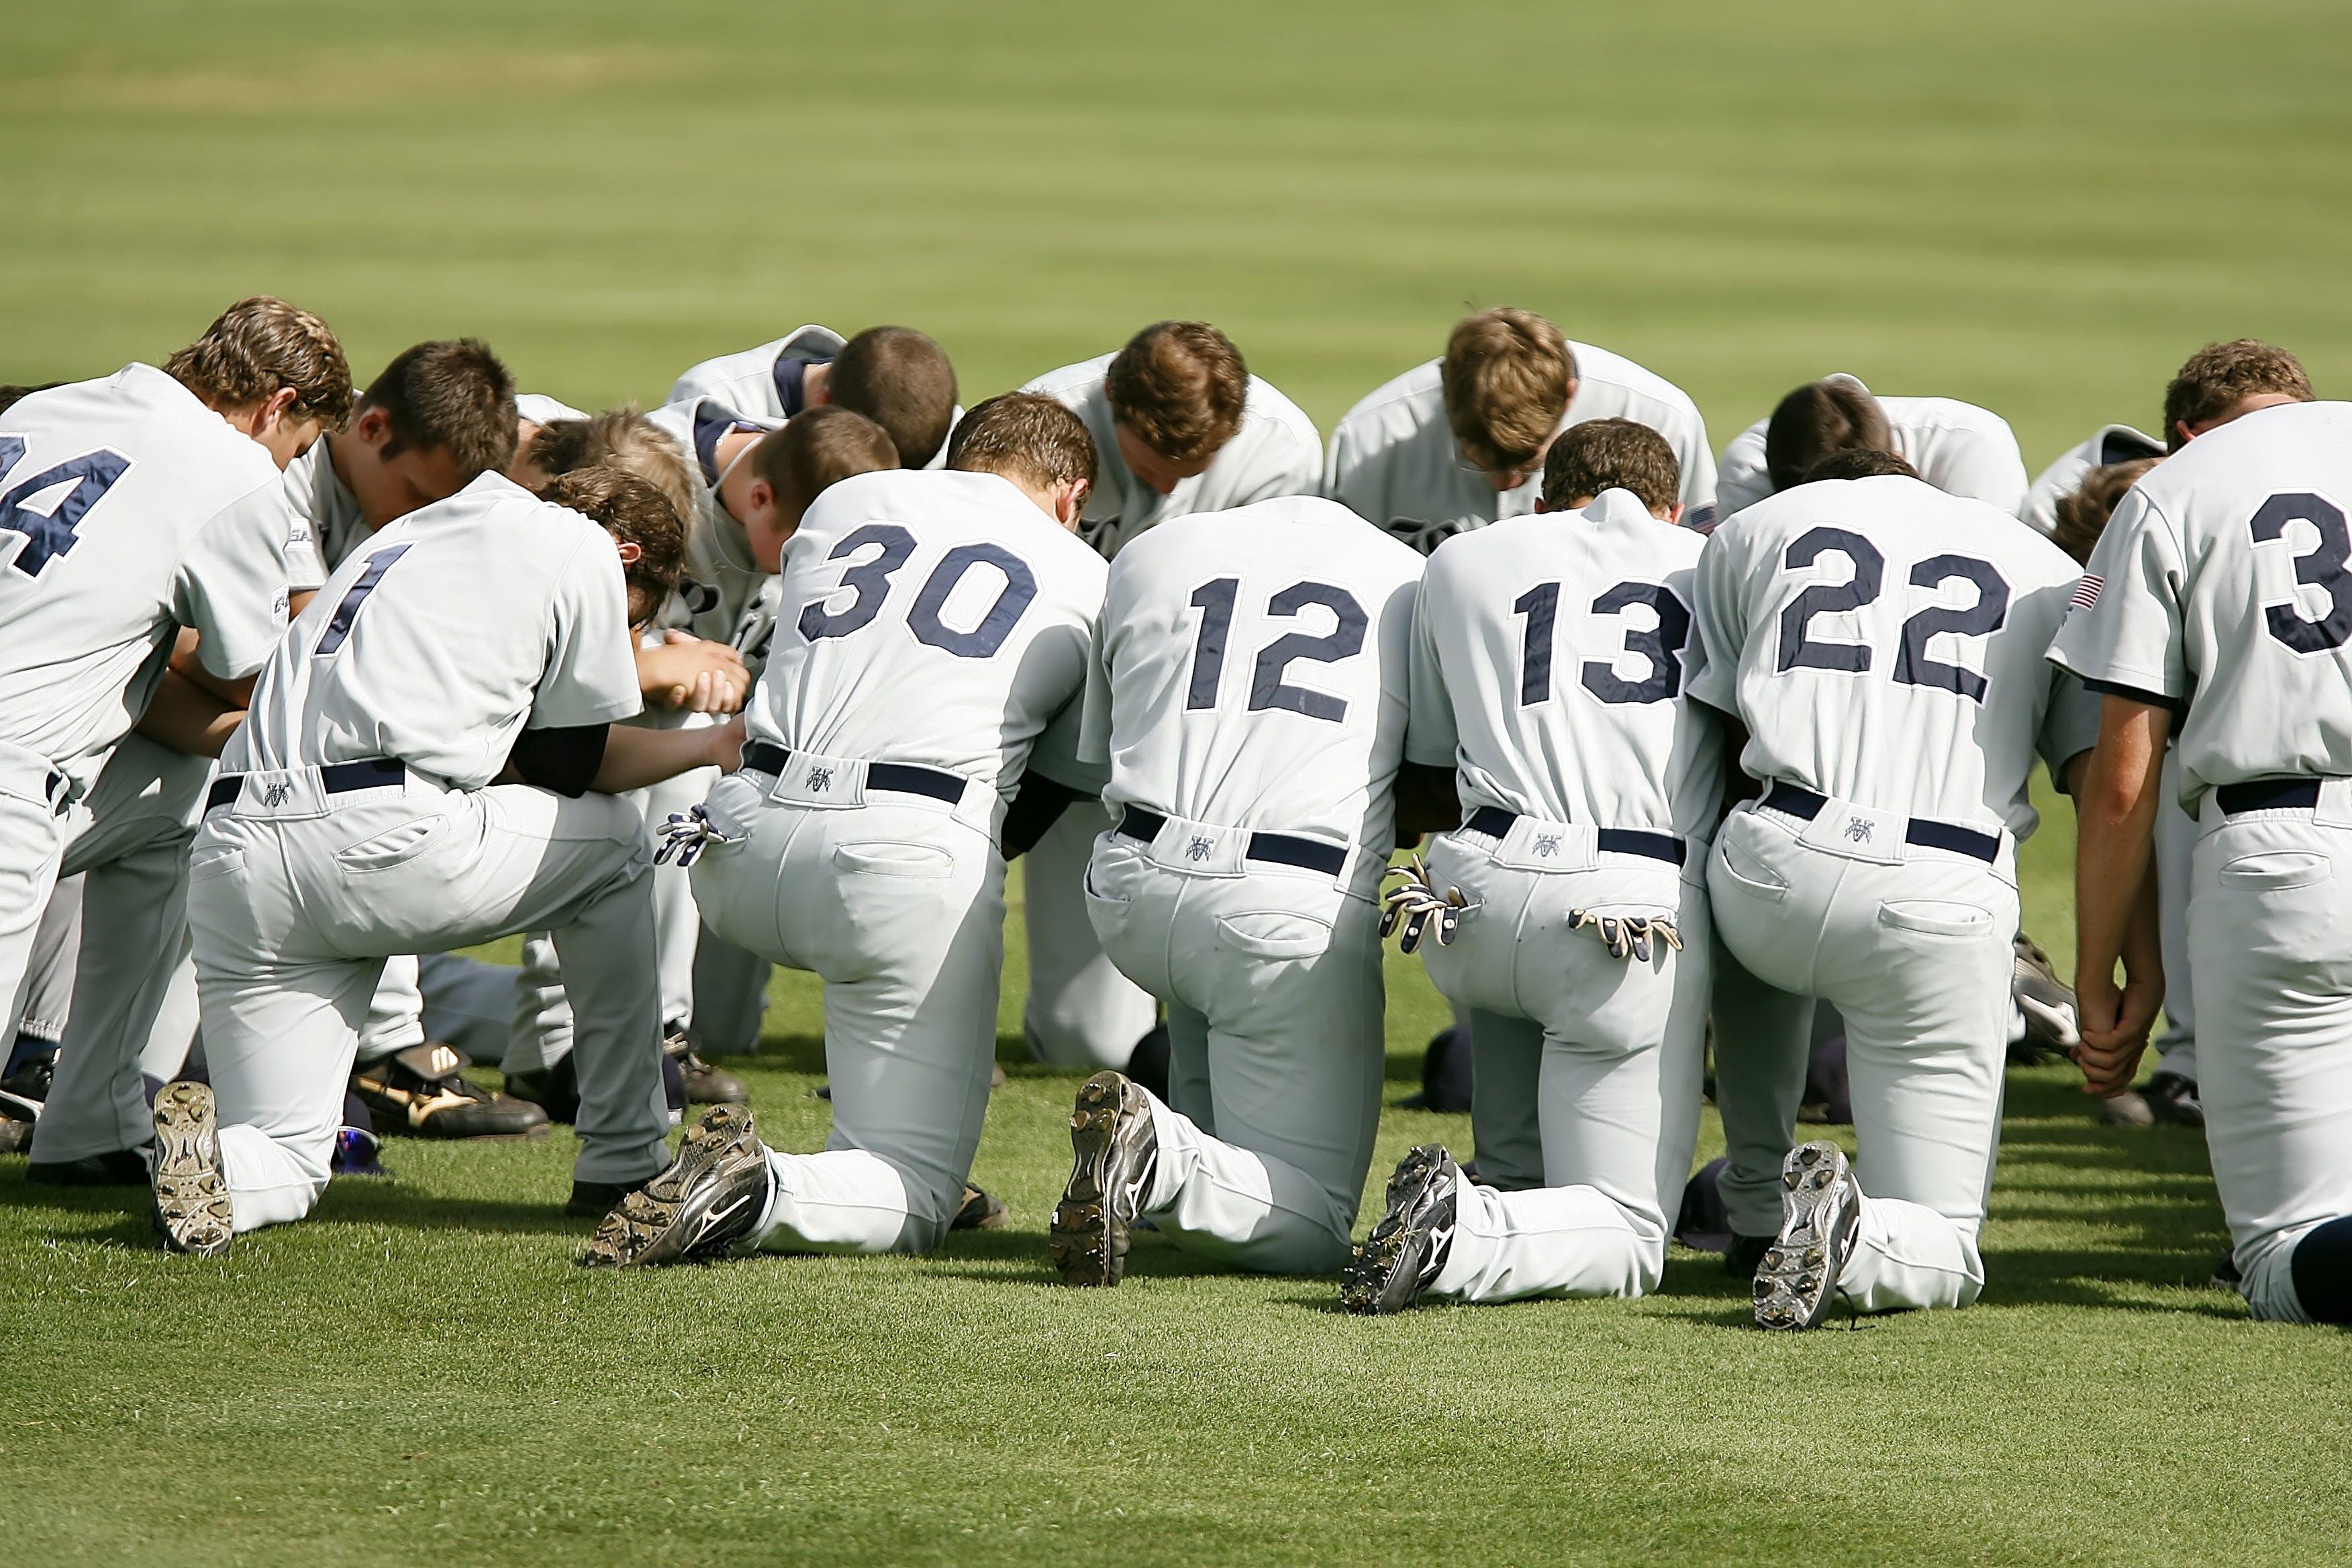 Baseball Player Kneeling on Grass Field during Daytime